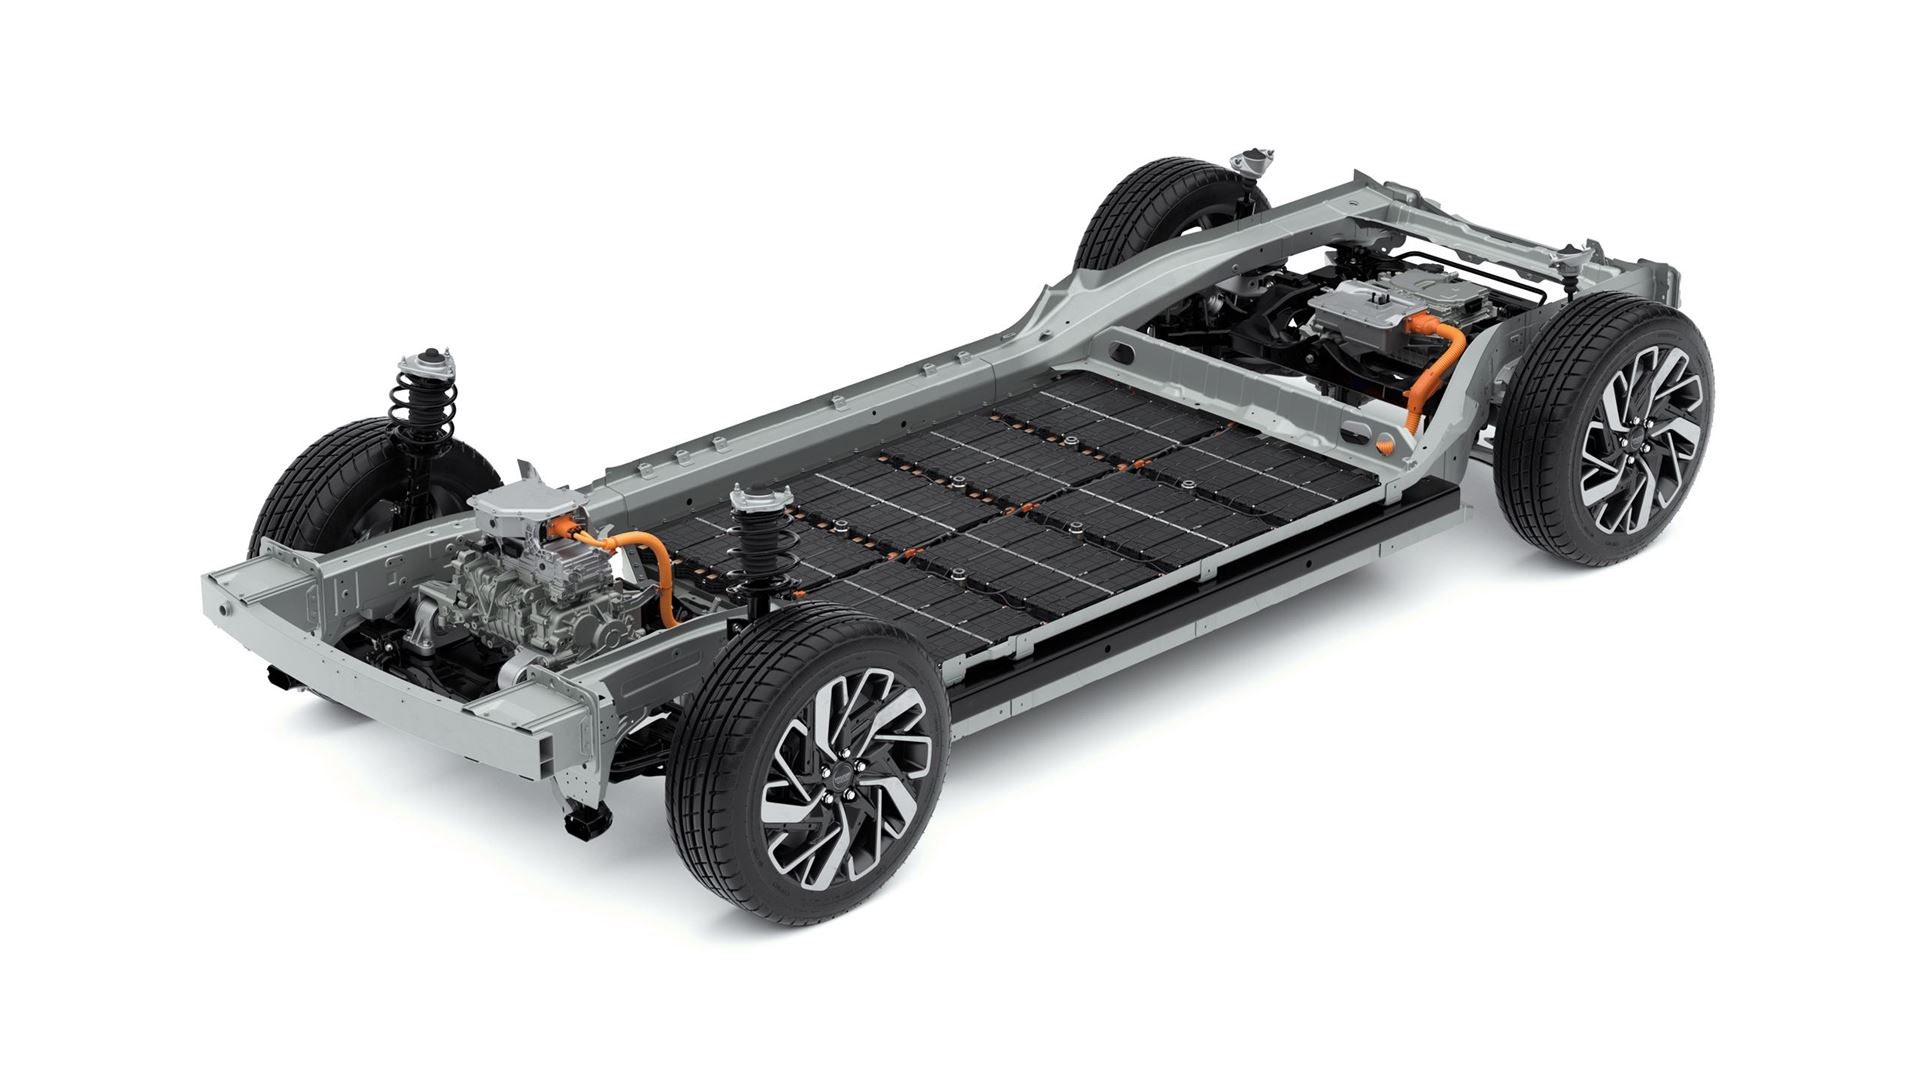 Hyundai Motor Group to Lead Charge into Electric Era with Dedicated EV Platform 'E-GMP' - Image 1